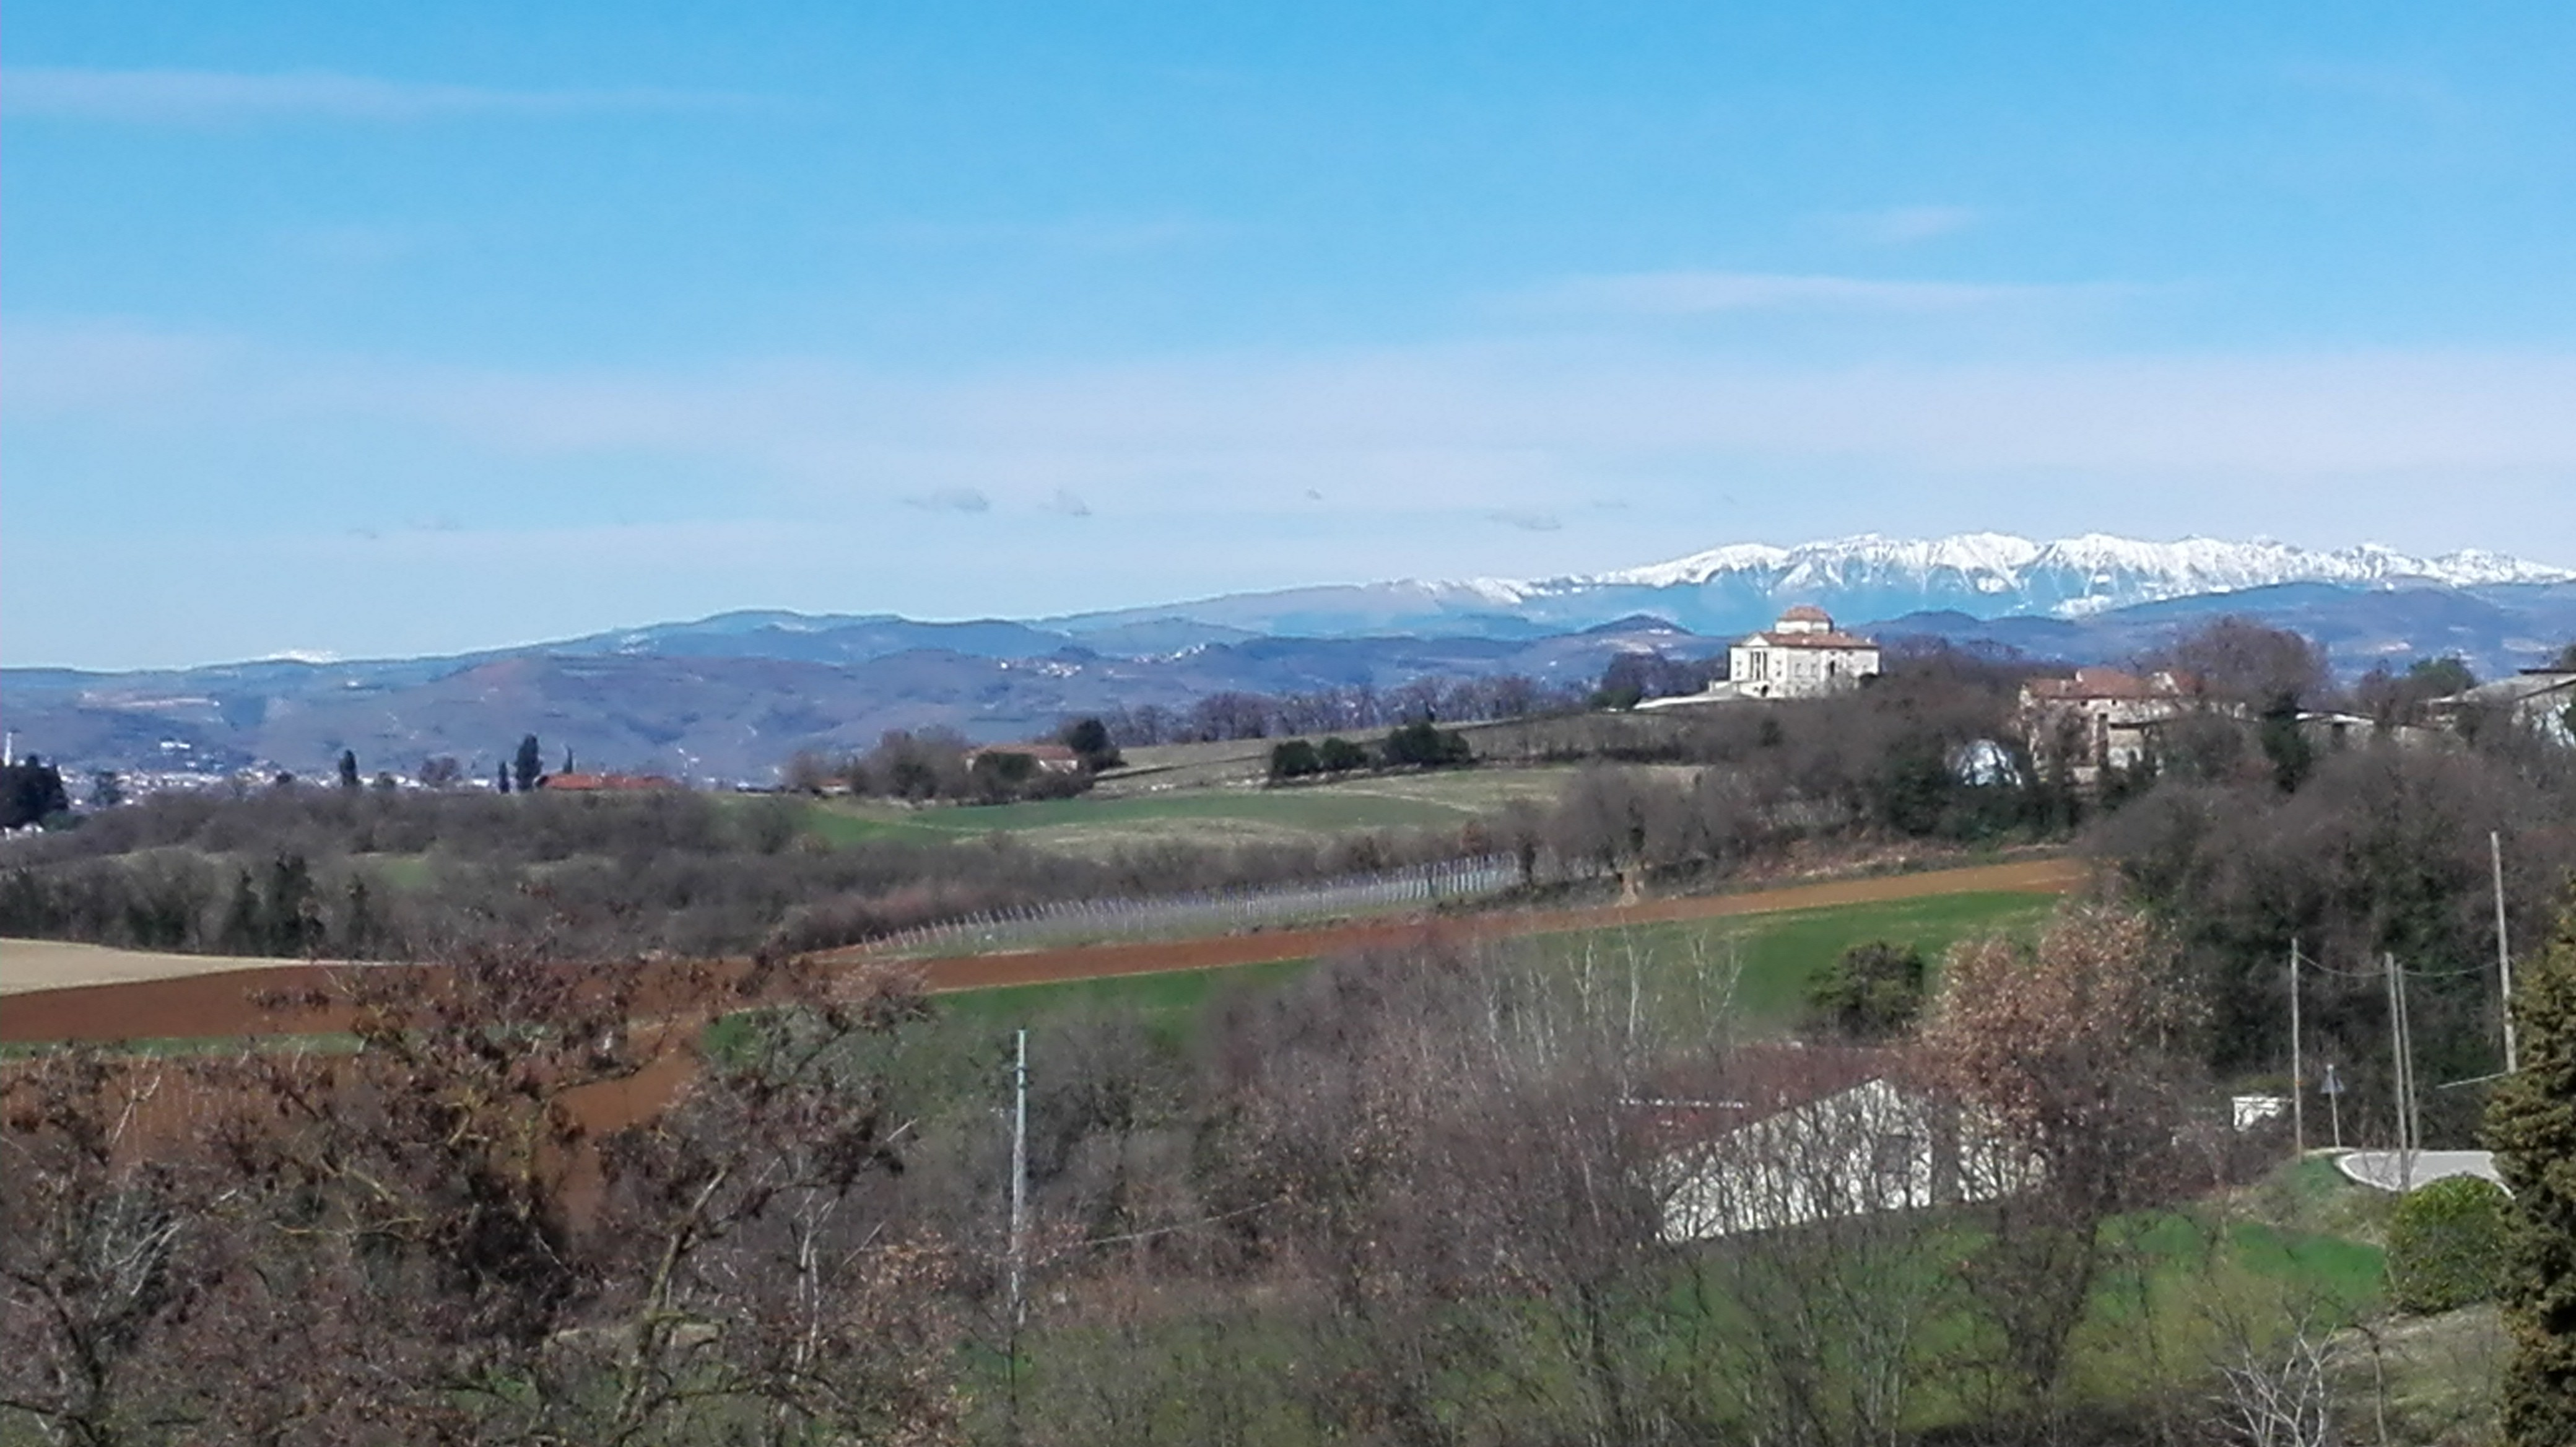 Image of Hilltop Vineyard Winery in the Veneto